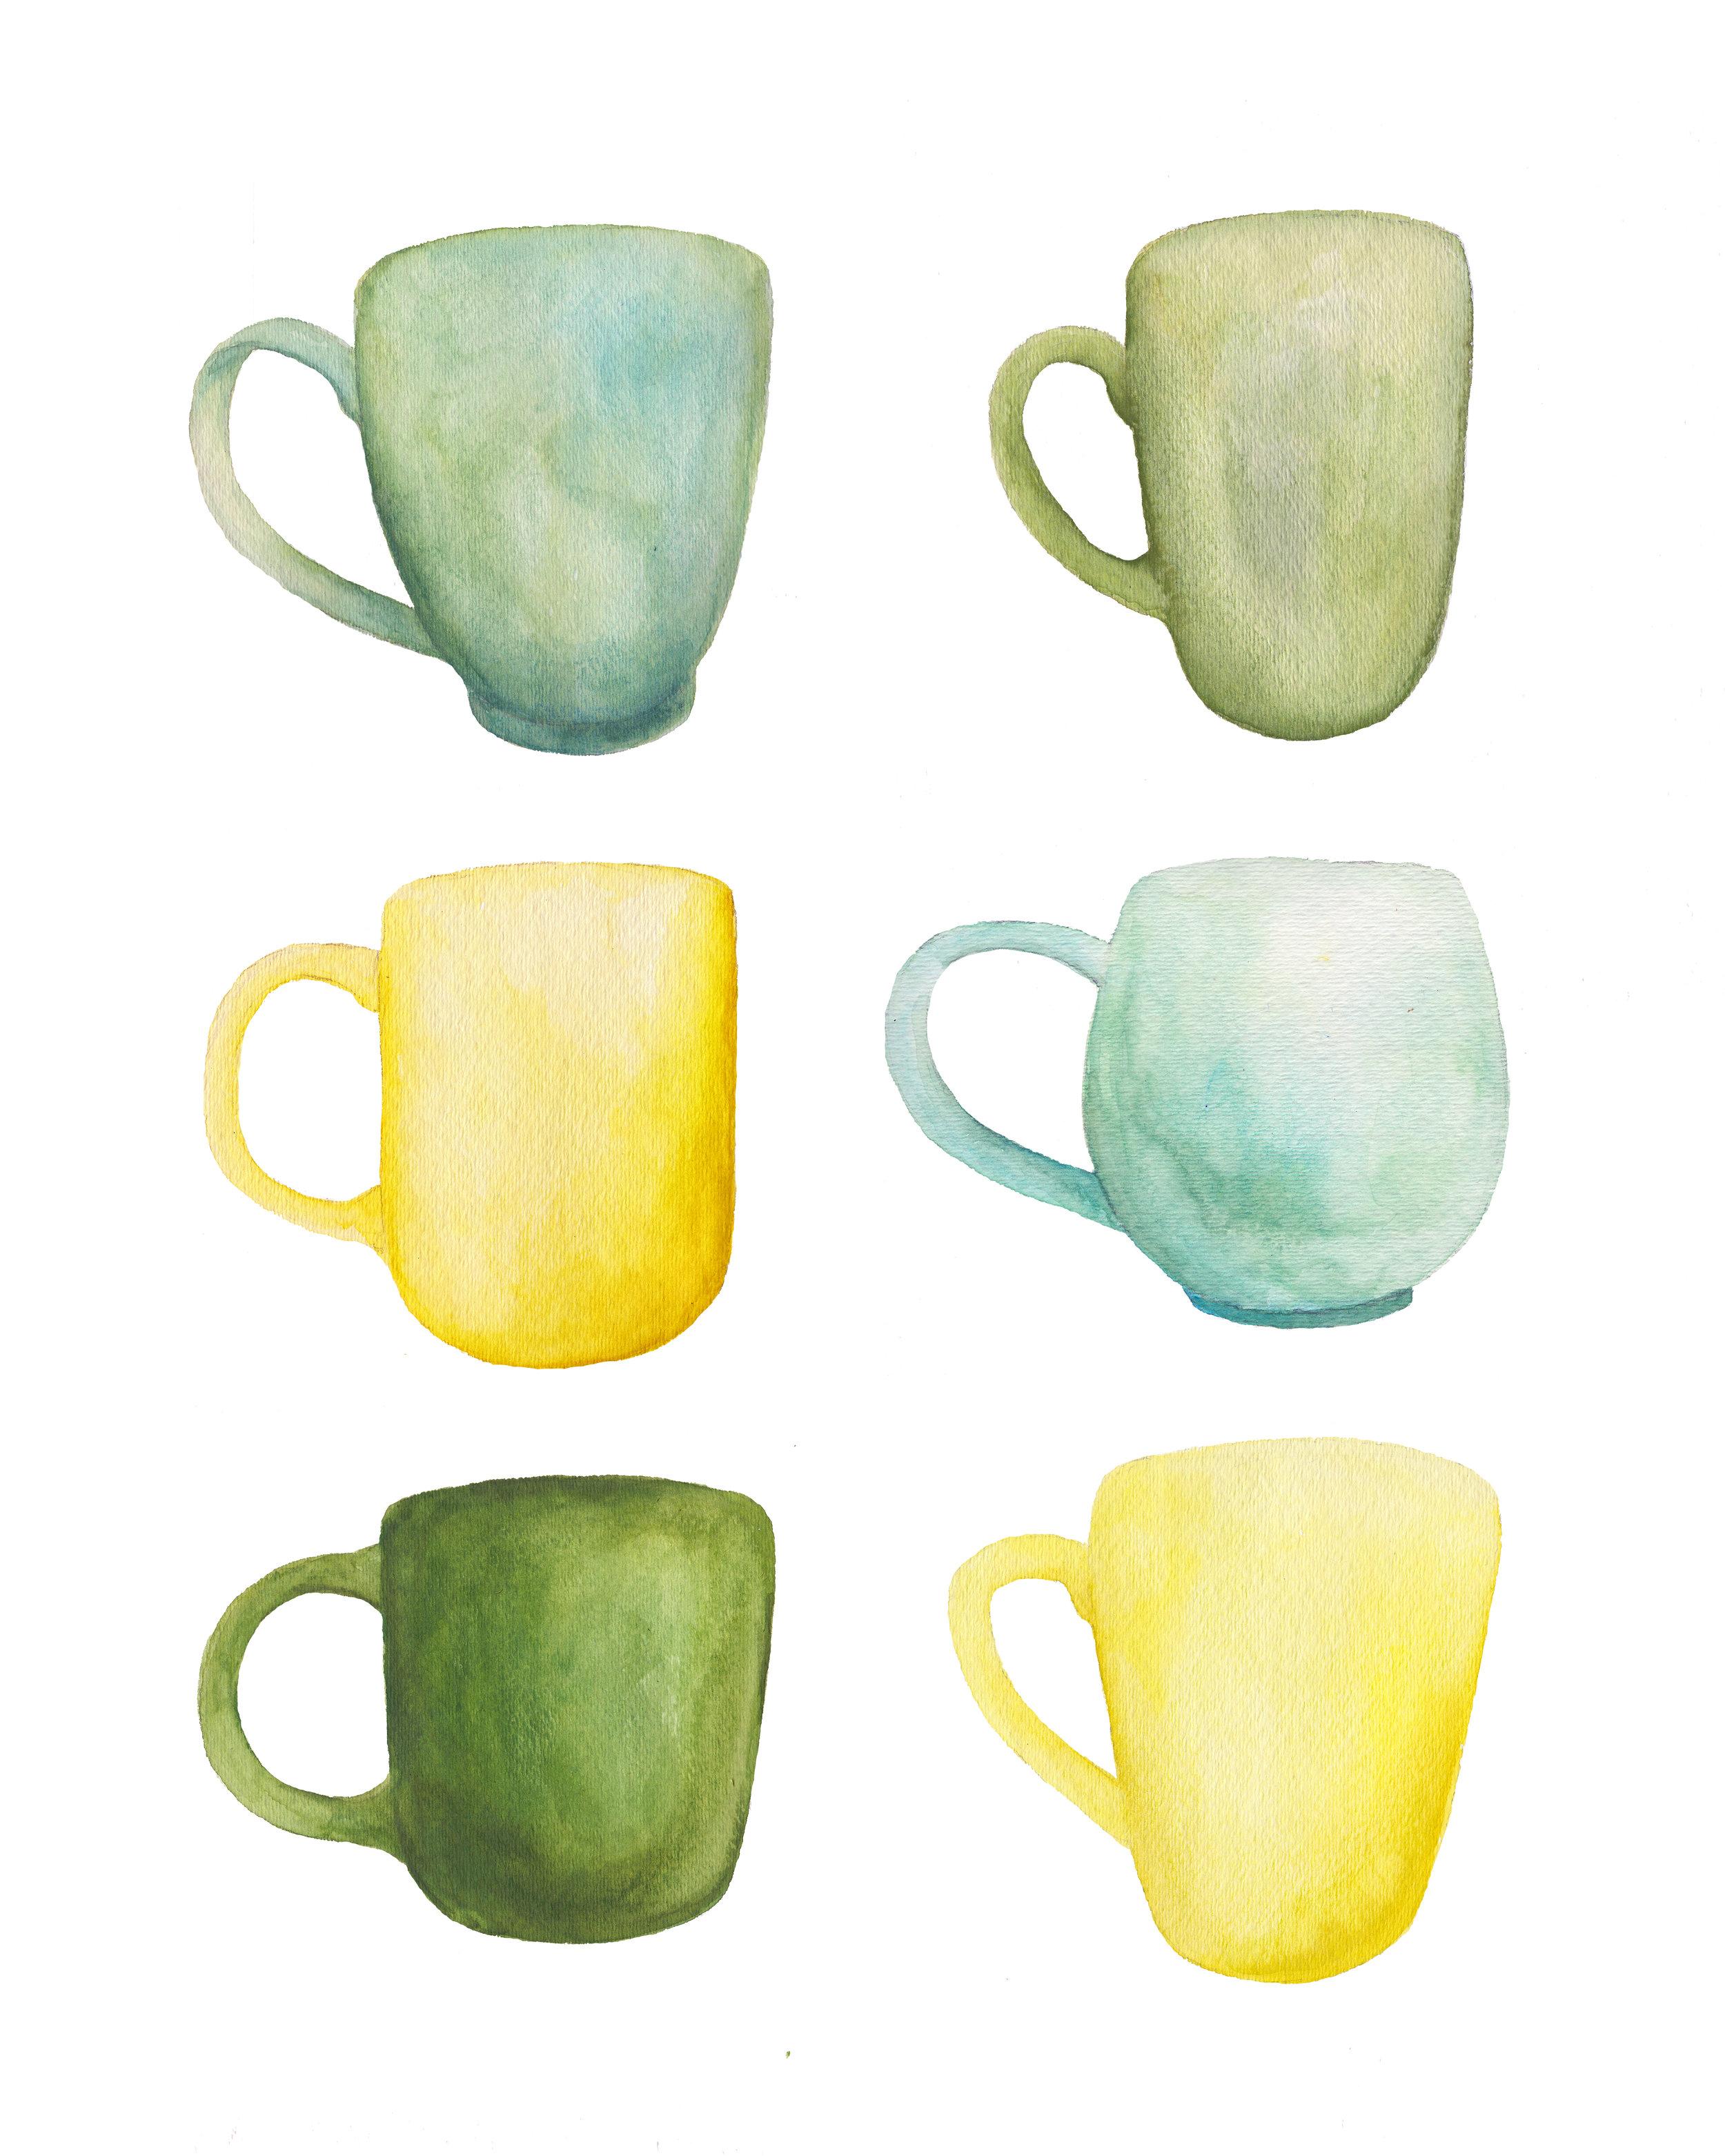 mugs8x10.jpg